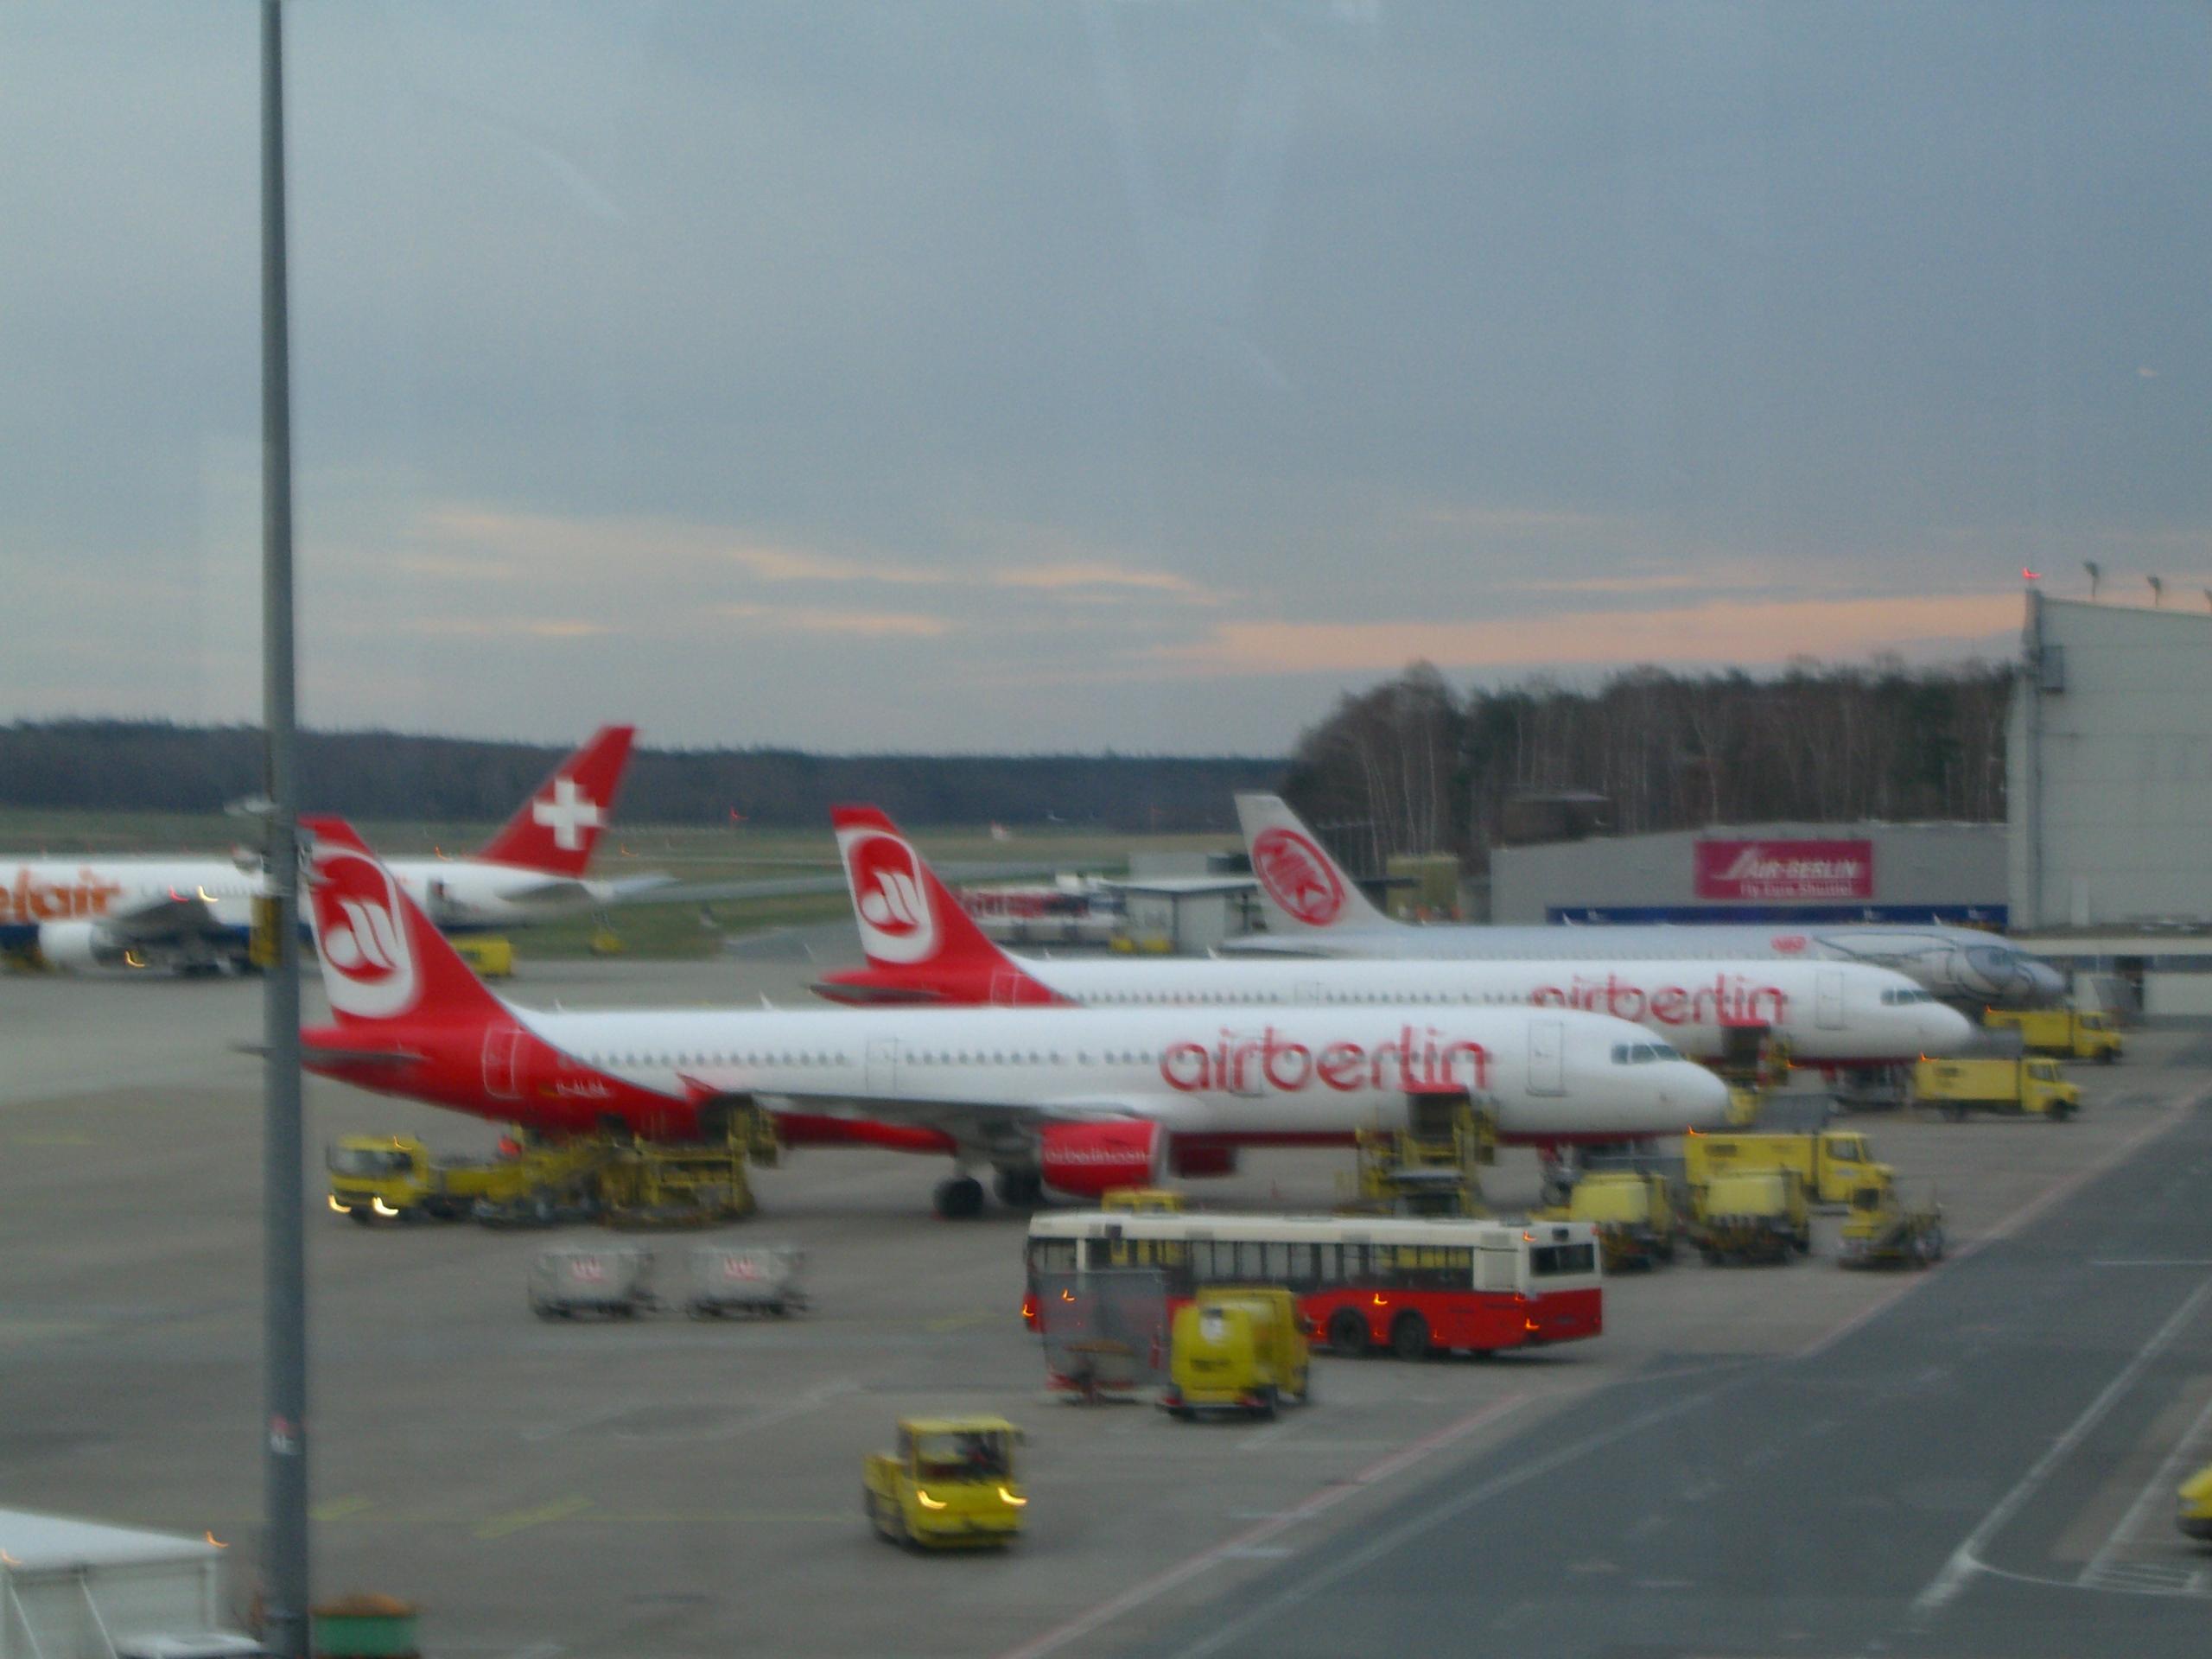 Air Berlin Aktuelle Nachrichten News Bilder Videos 2015 | Personal ...